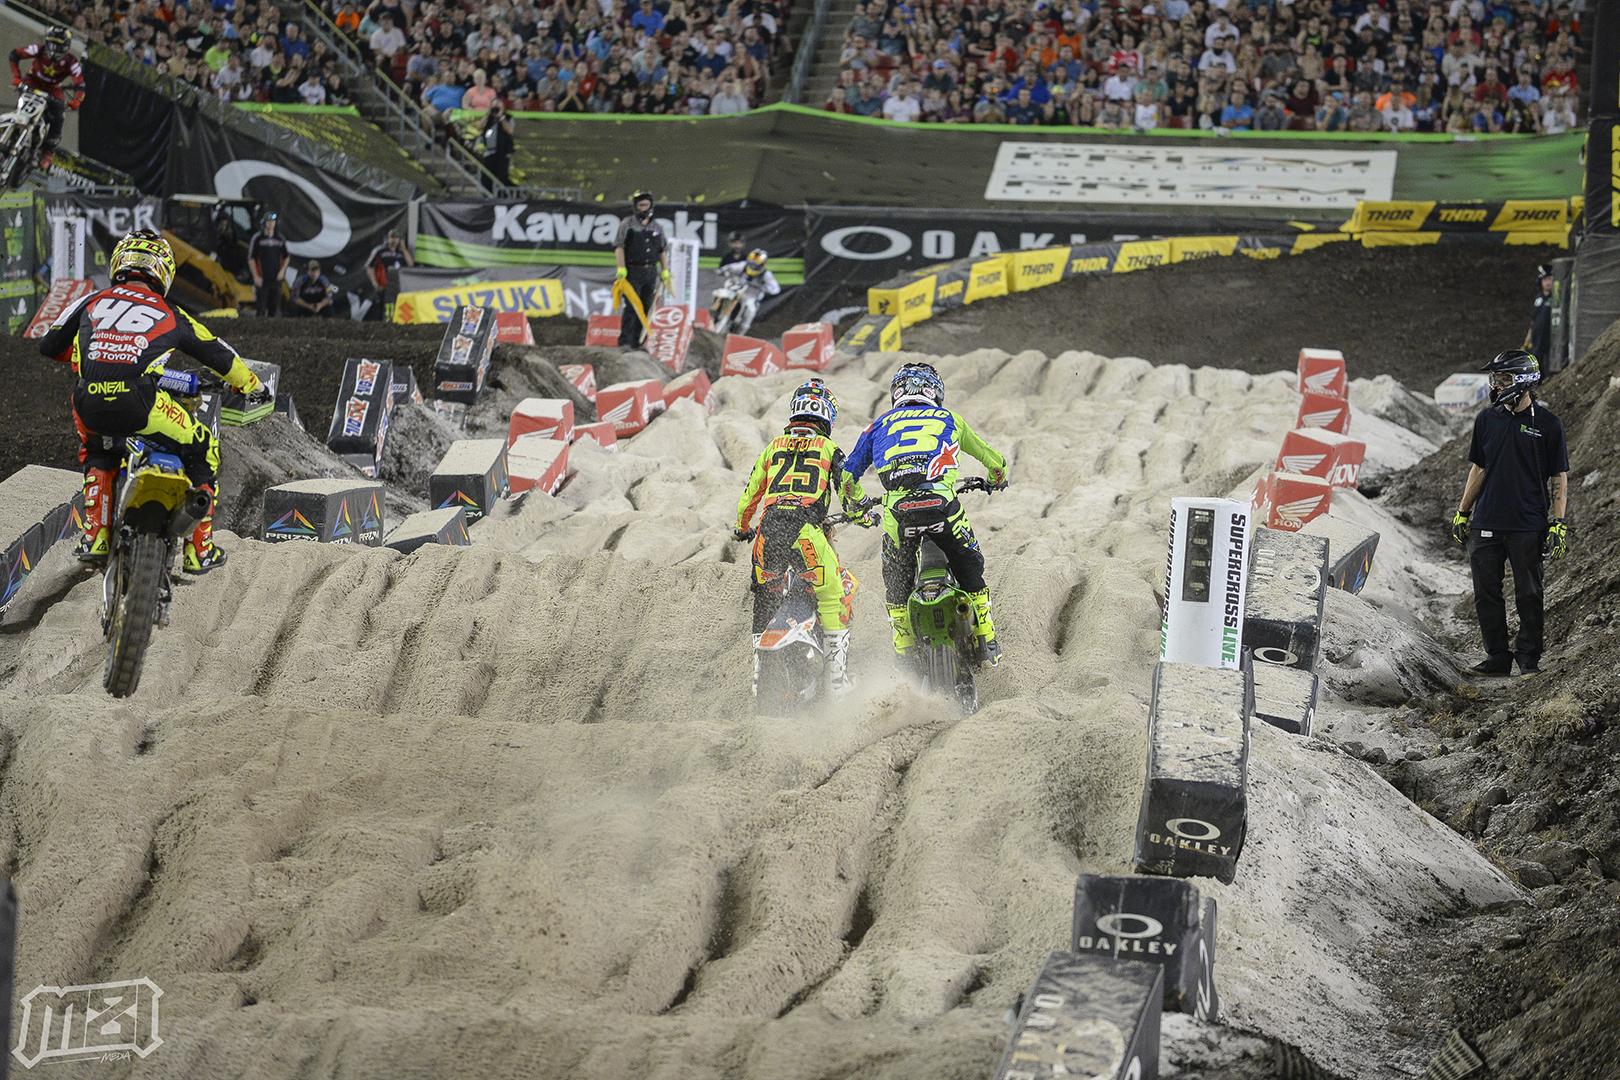 Tampa Supercross Battle